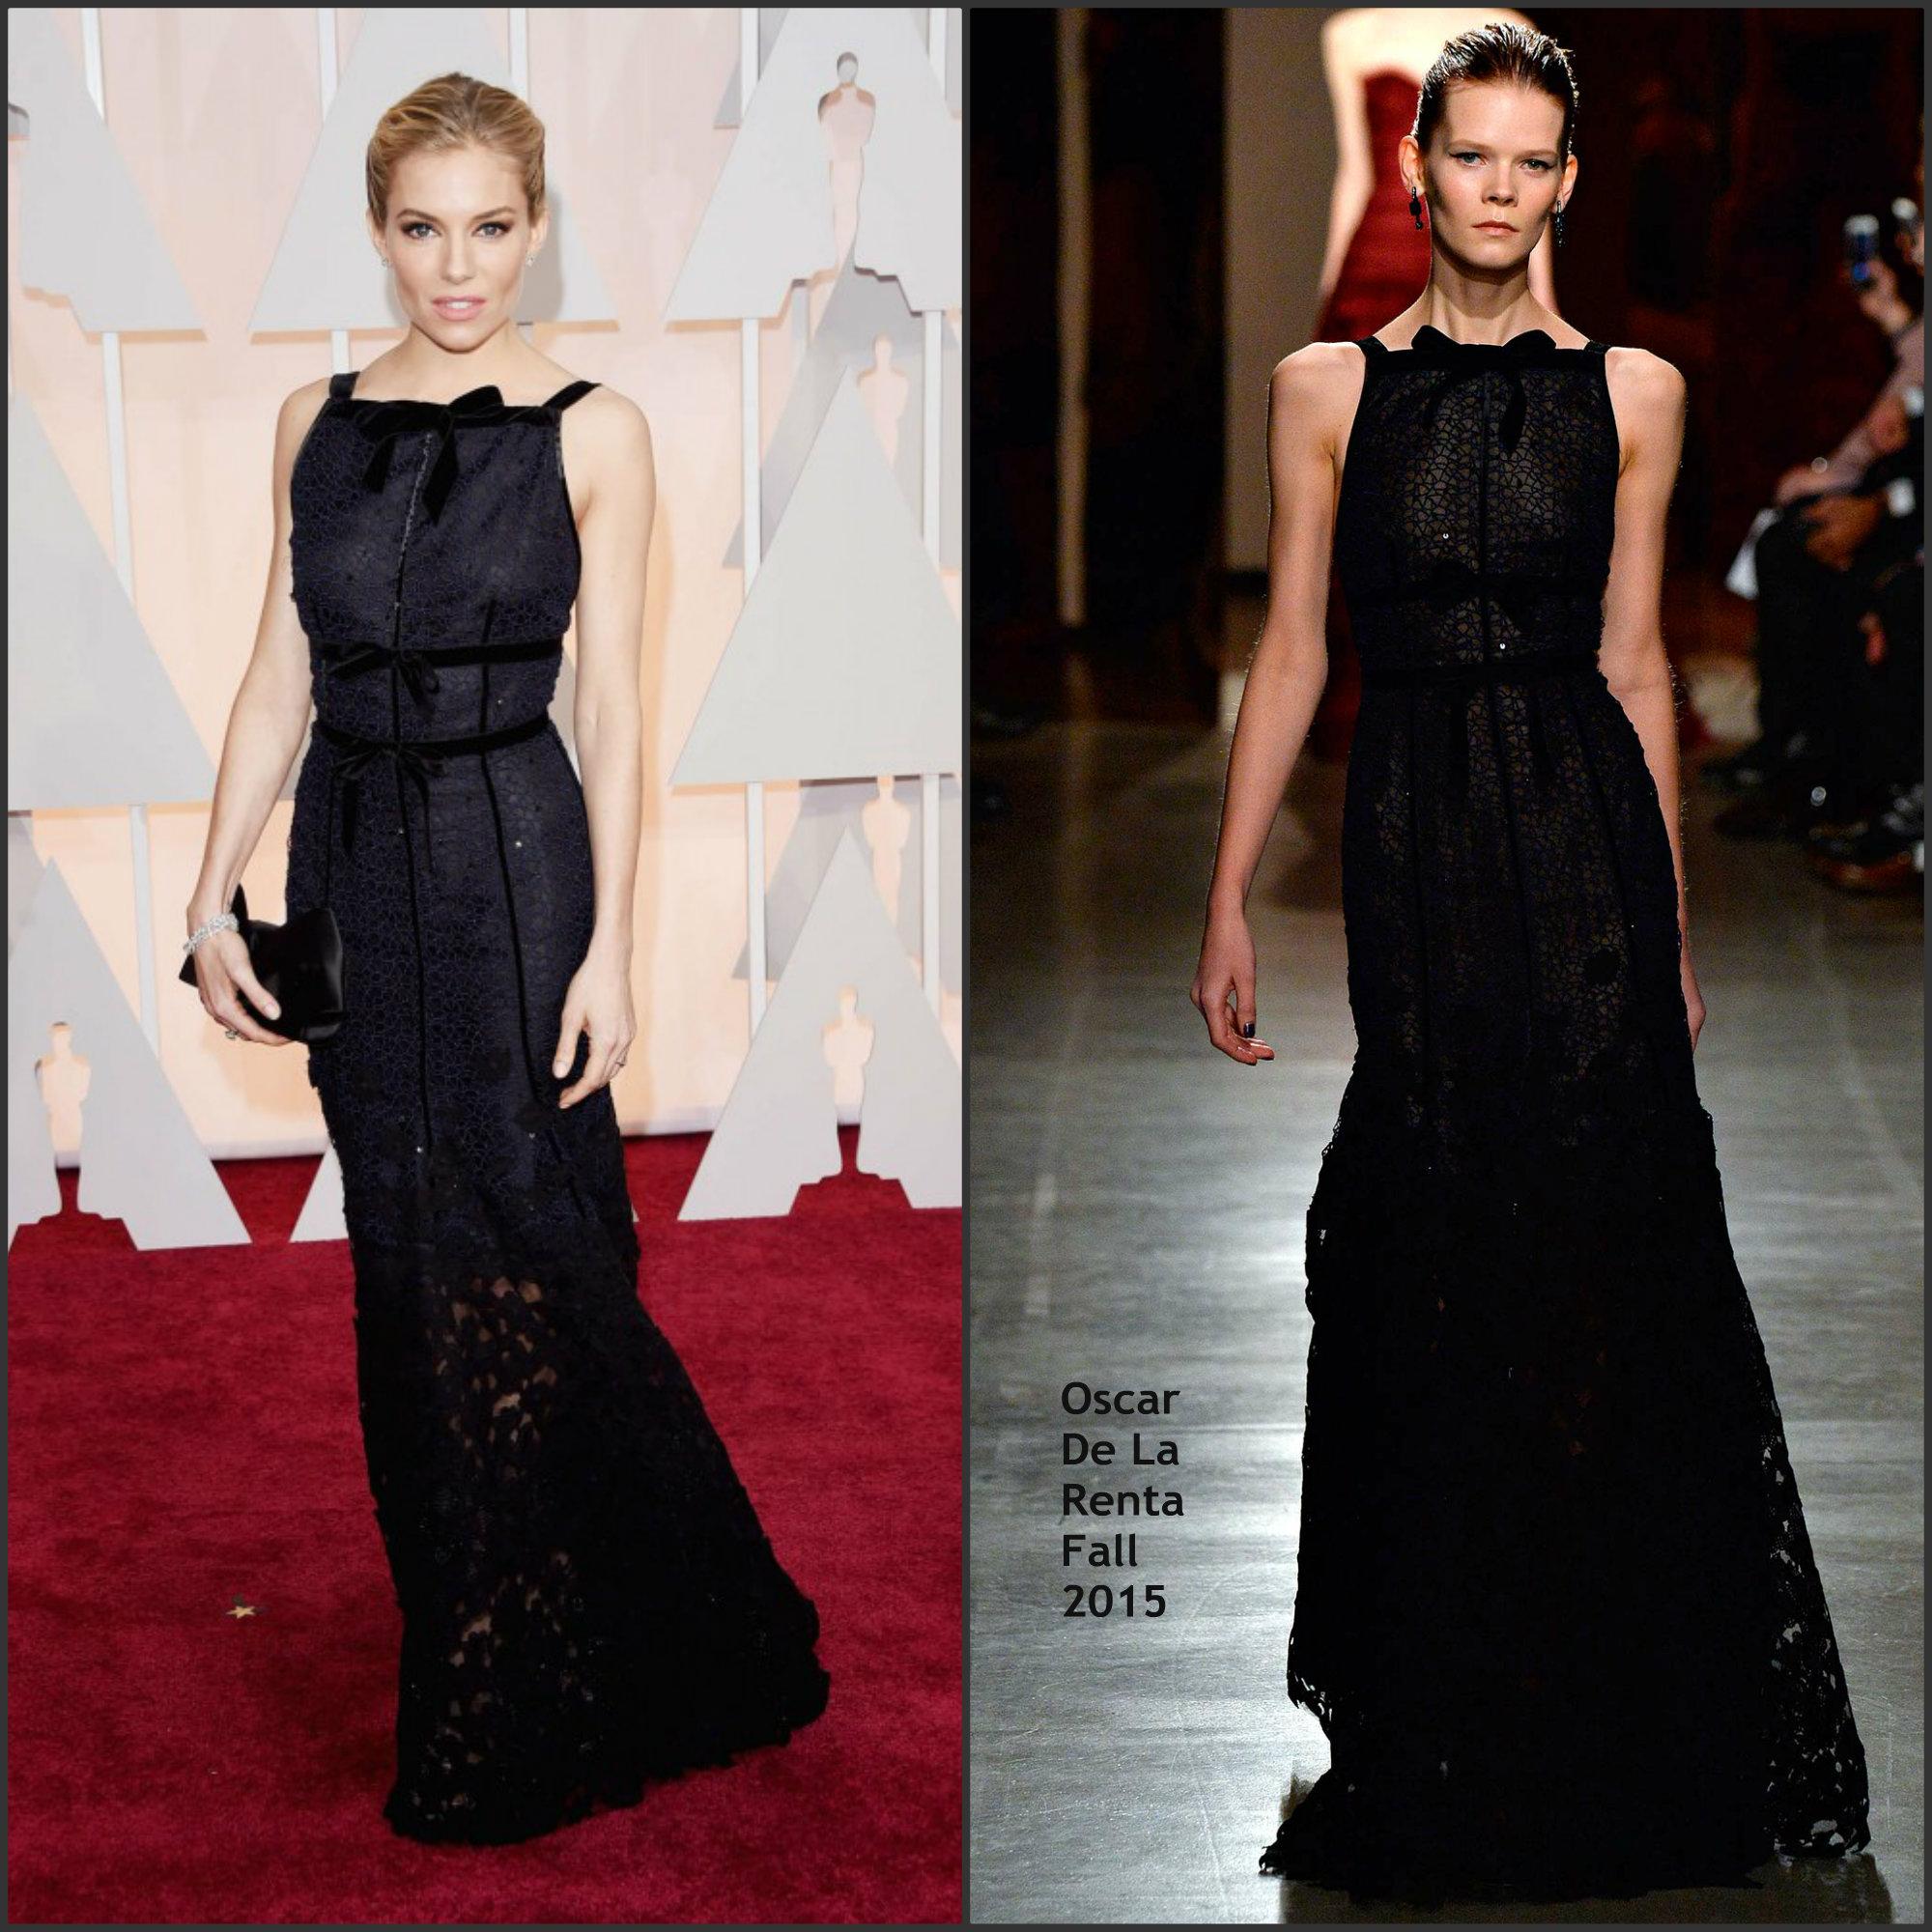 Sienna-Miller-In-Oscar-De-La-Renta-at-the-2015-Oscars